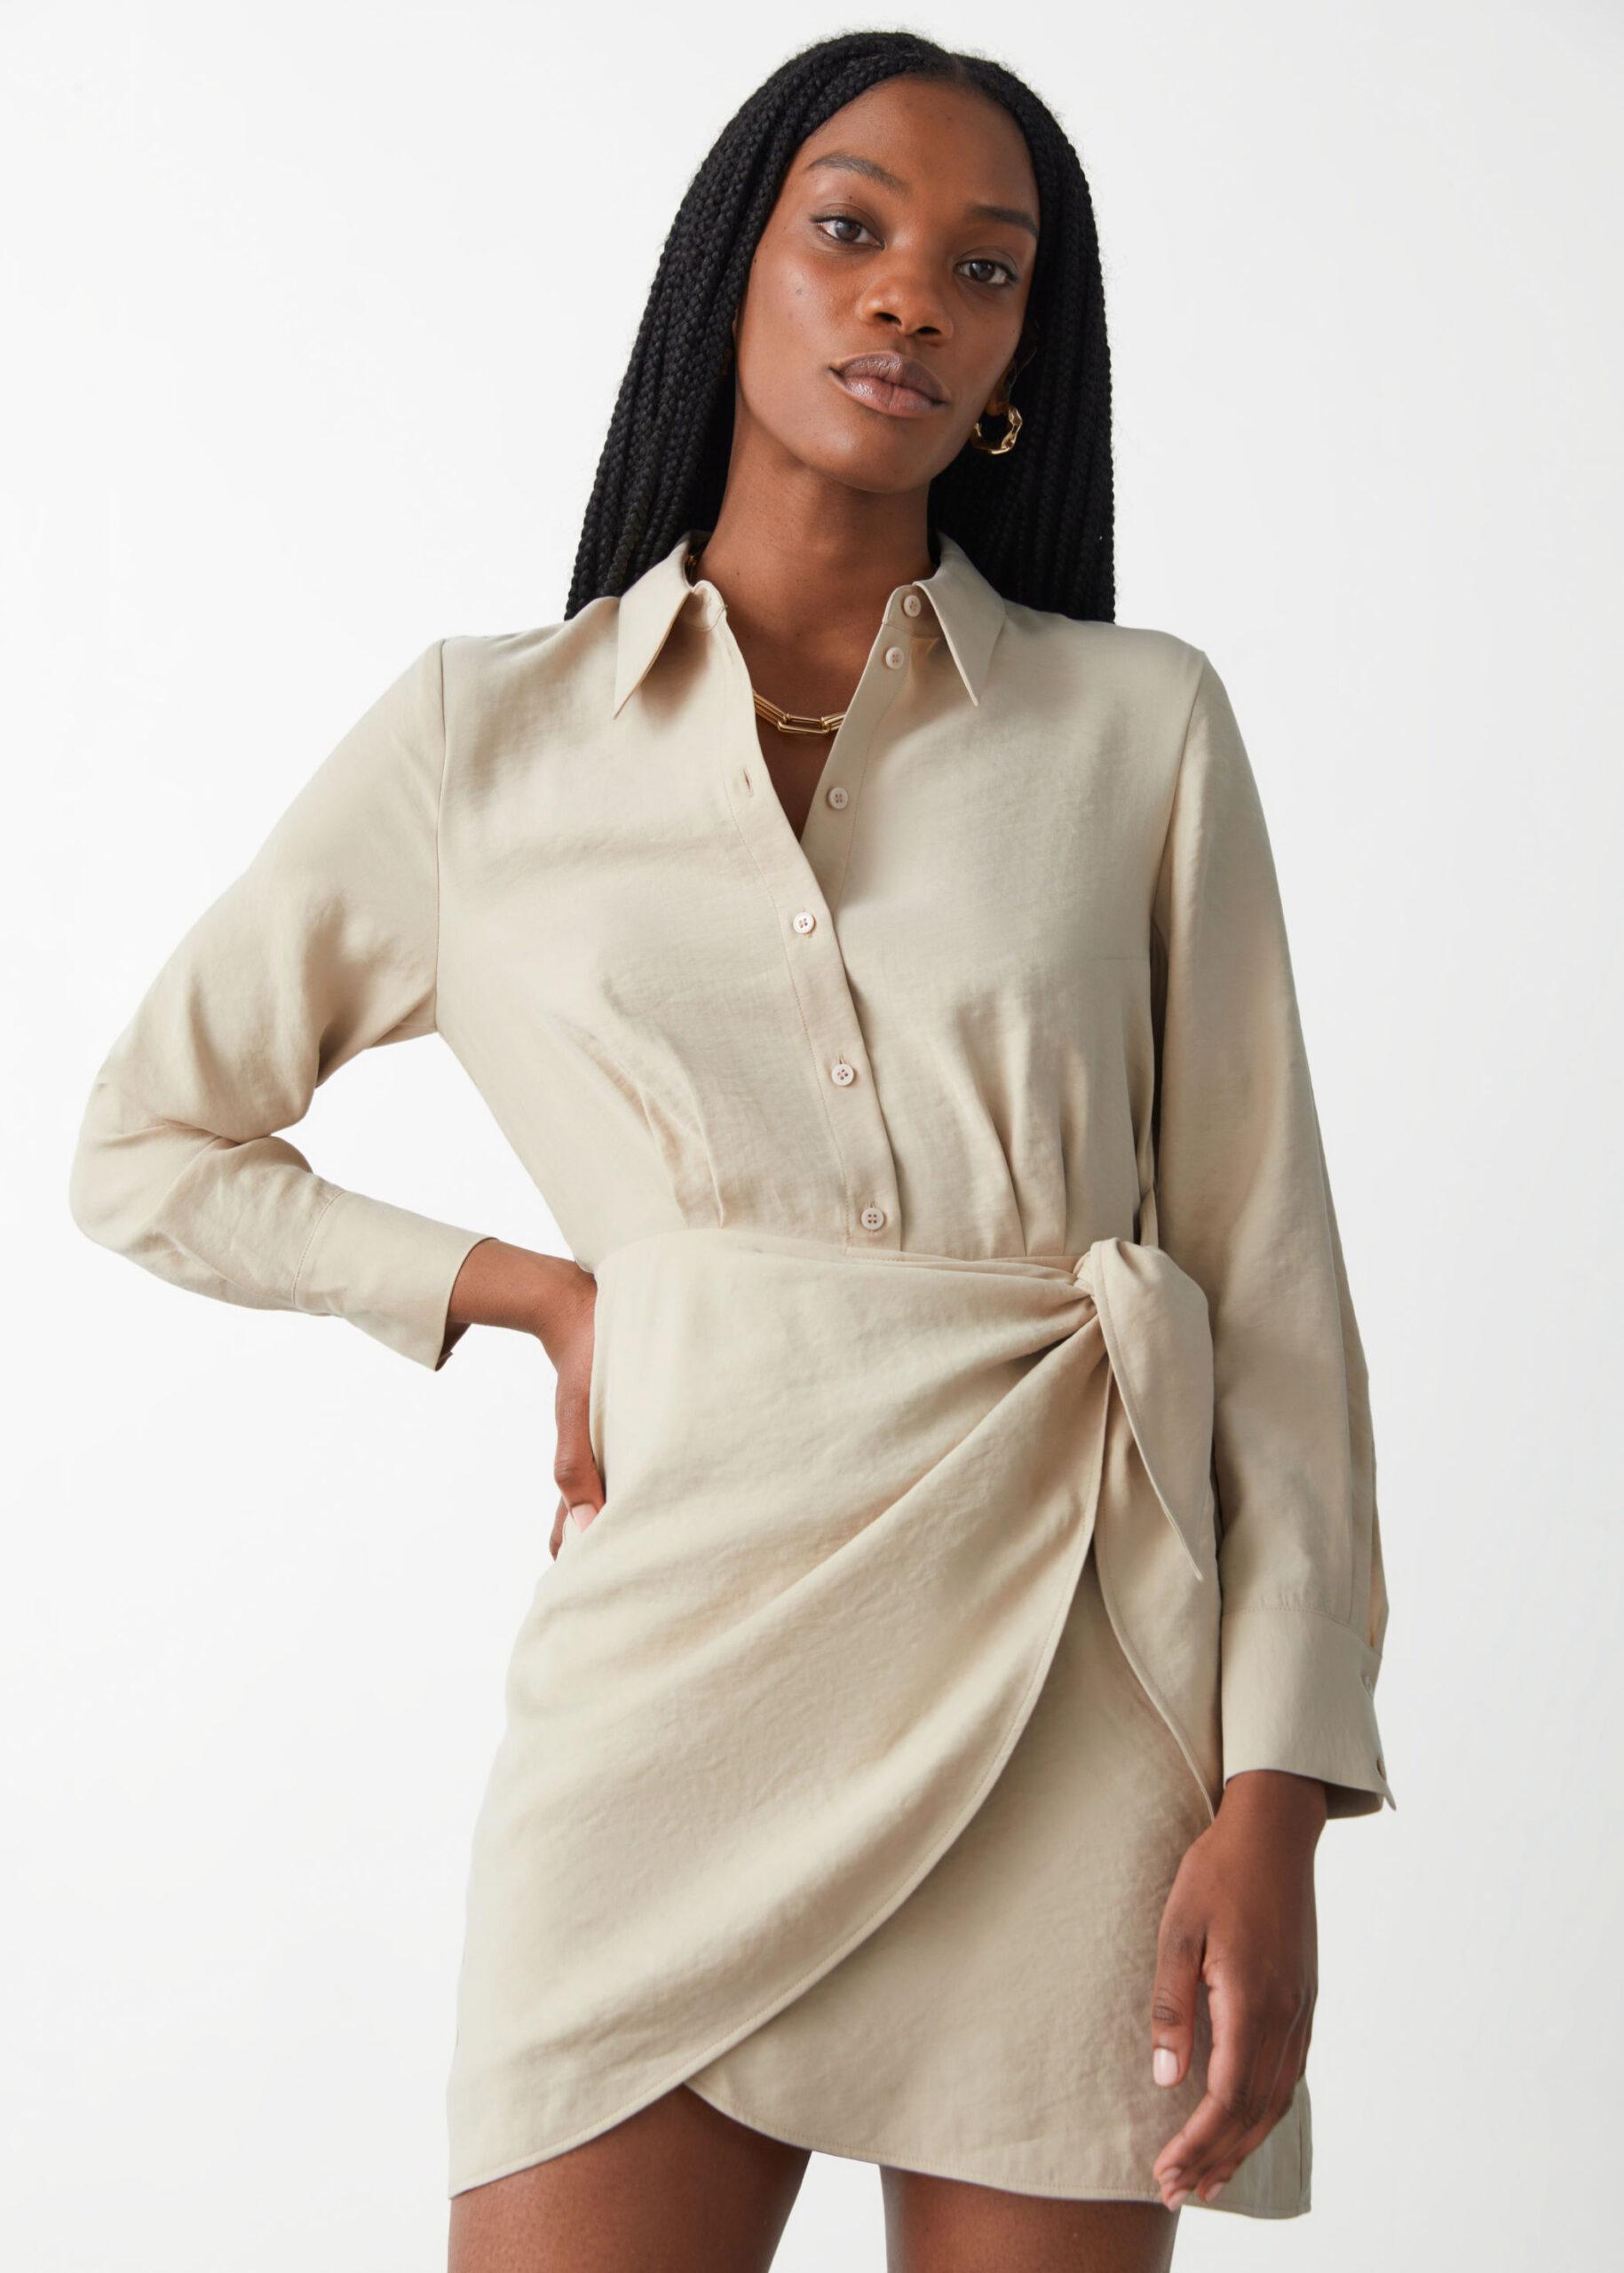 Buttoned Mini Wrap Dress $89